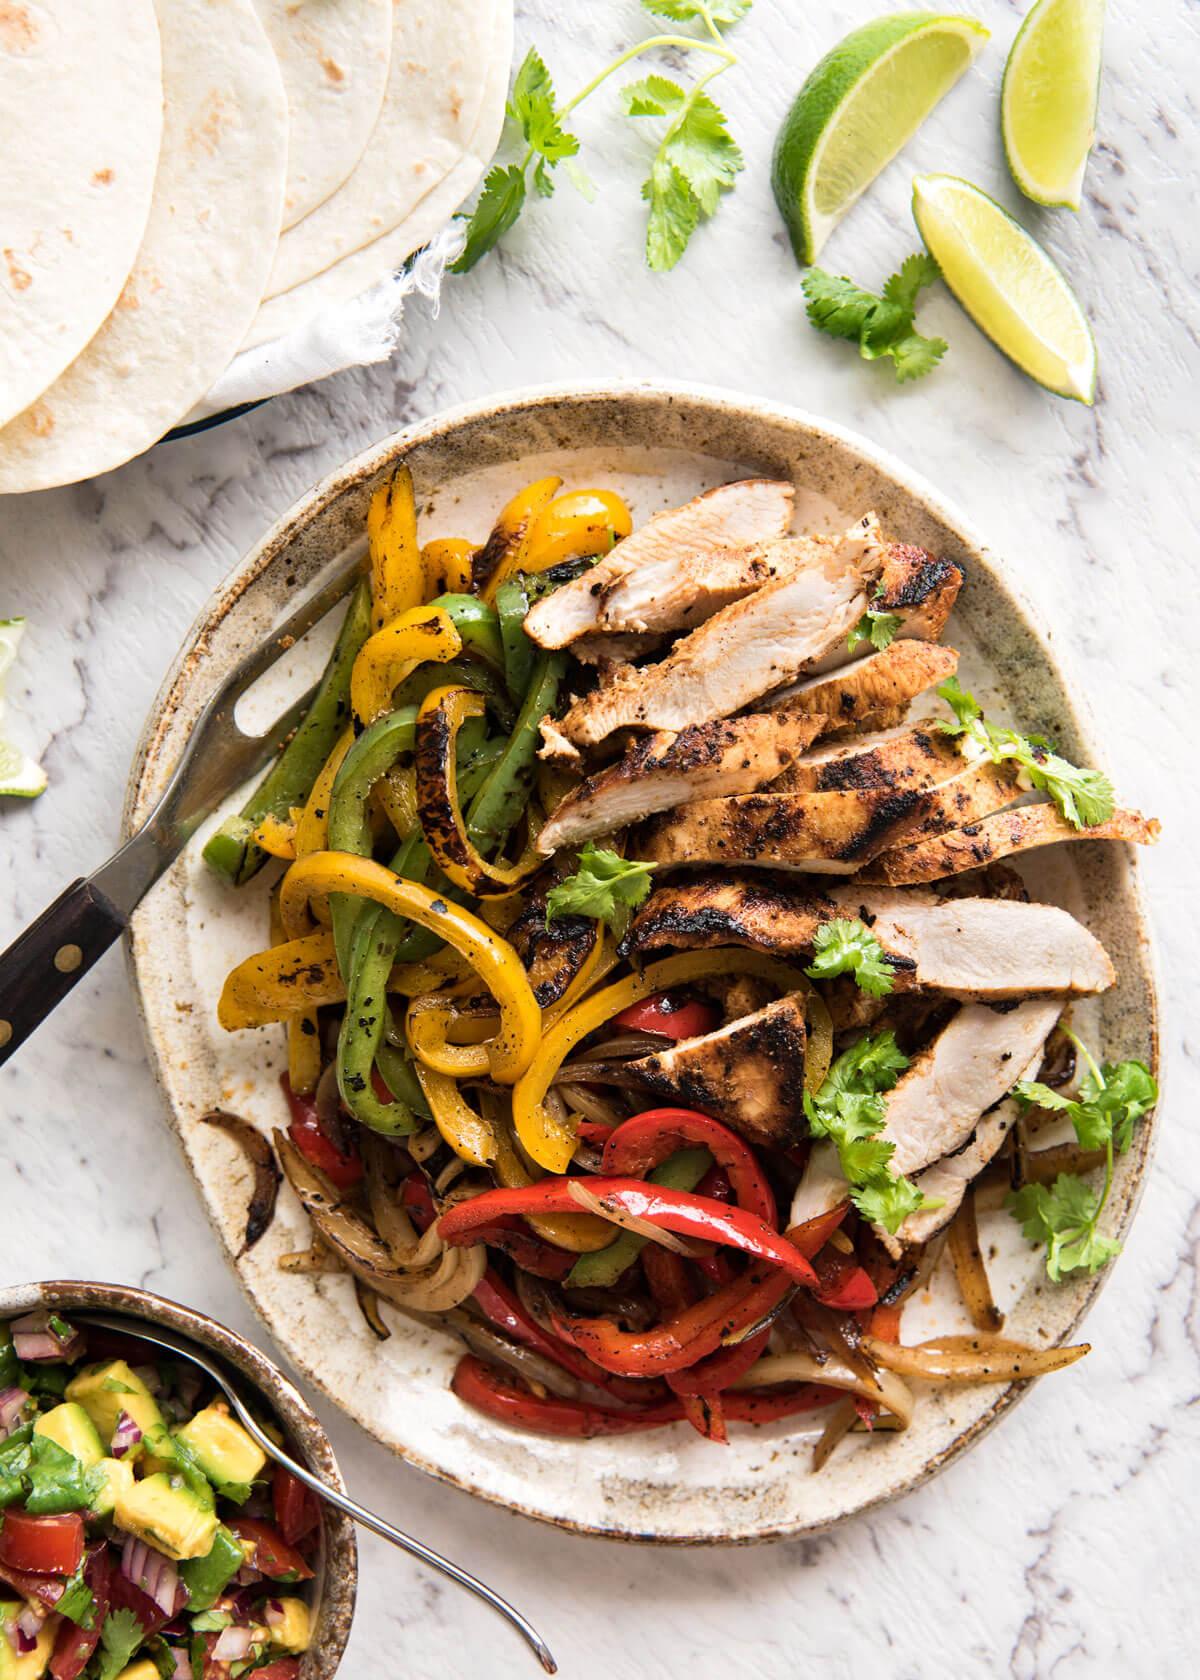 Мексиканская кухня: гайд Мексиканская кухня: гайд Chicken Fajitas 10